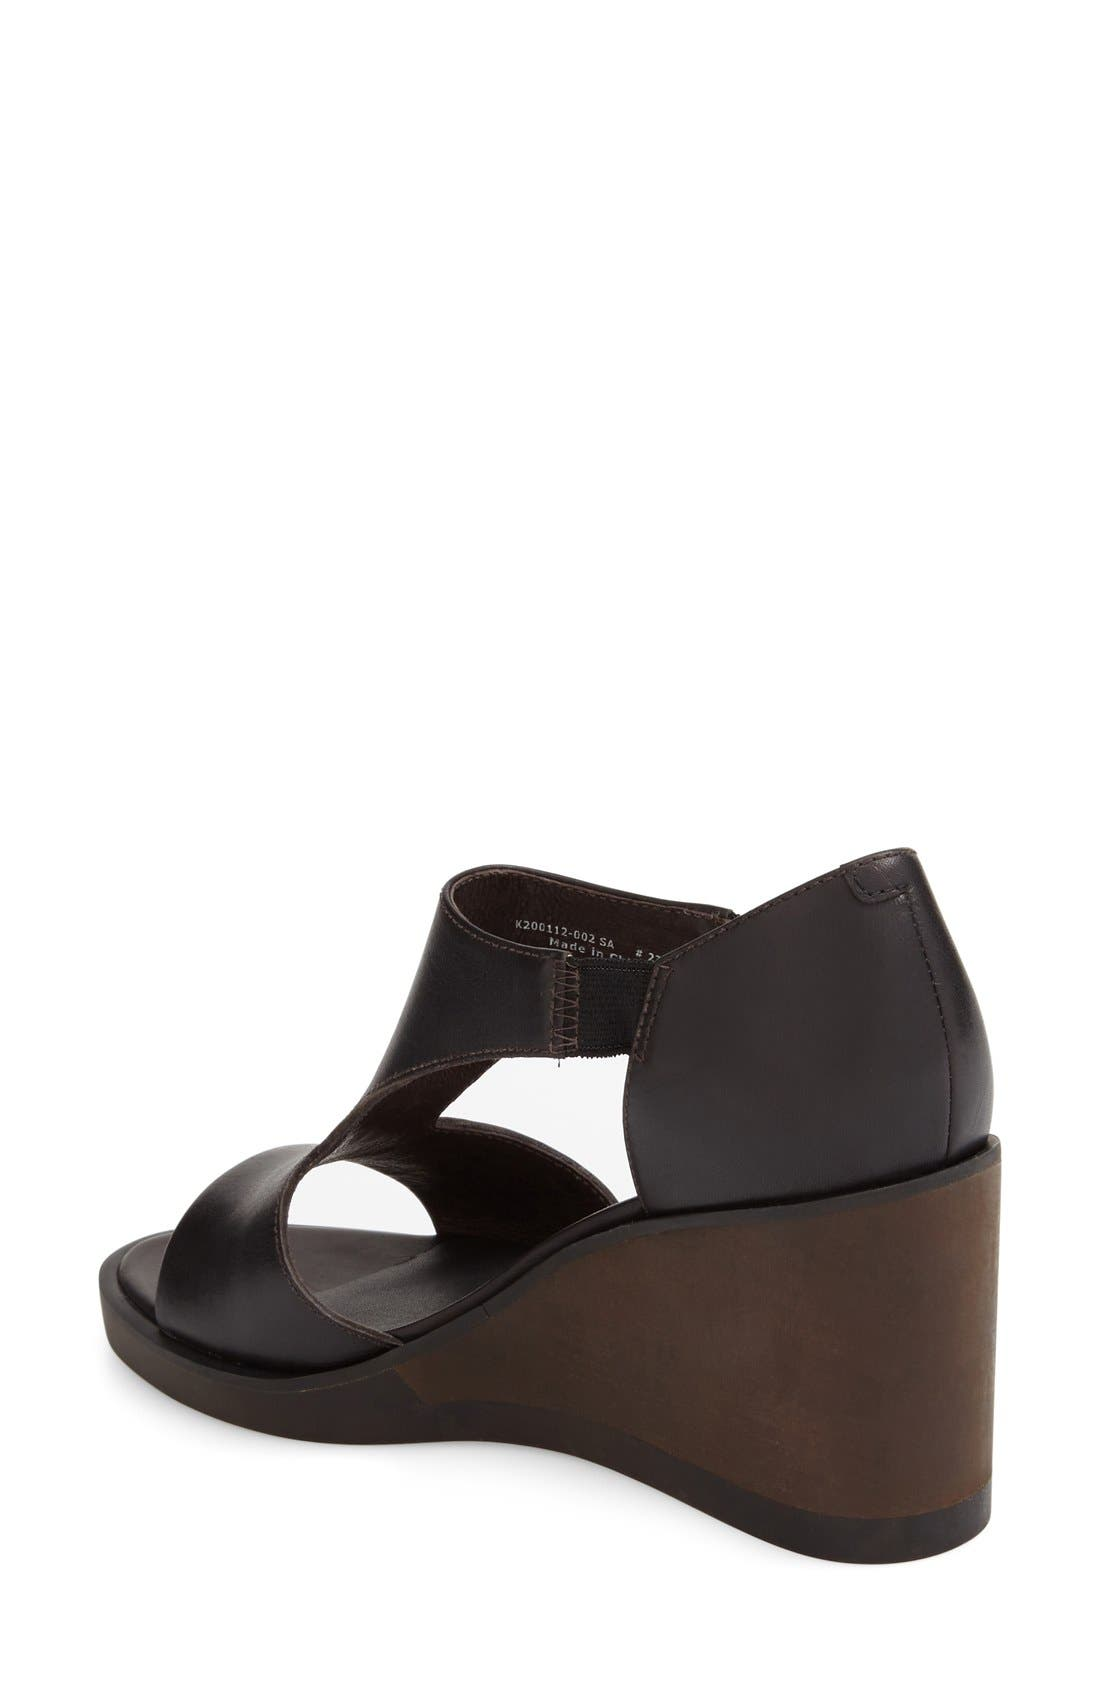 Alternate Image 2  - Camper 'Limi' Wedge Sandal (Women)